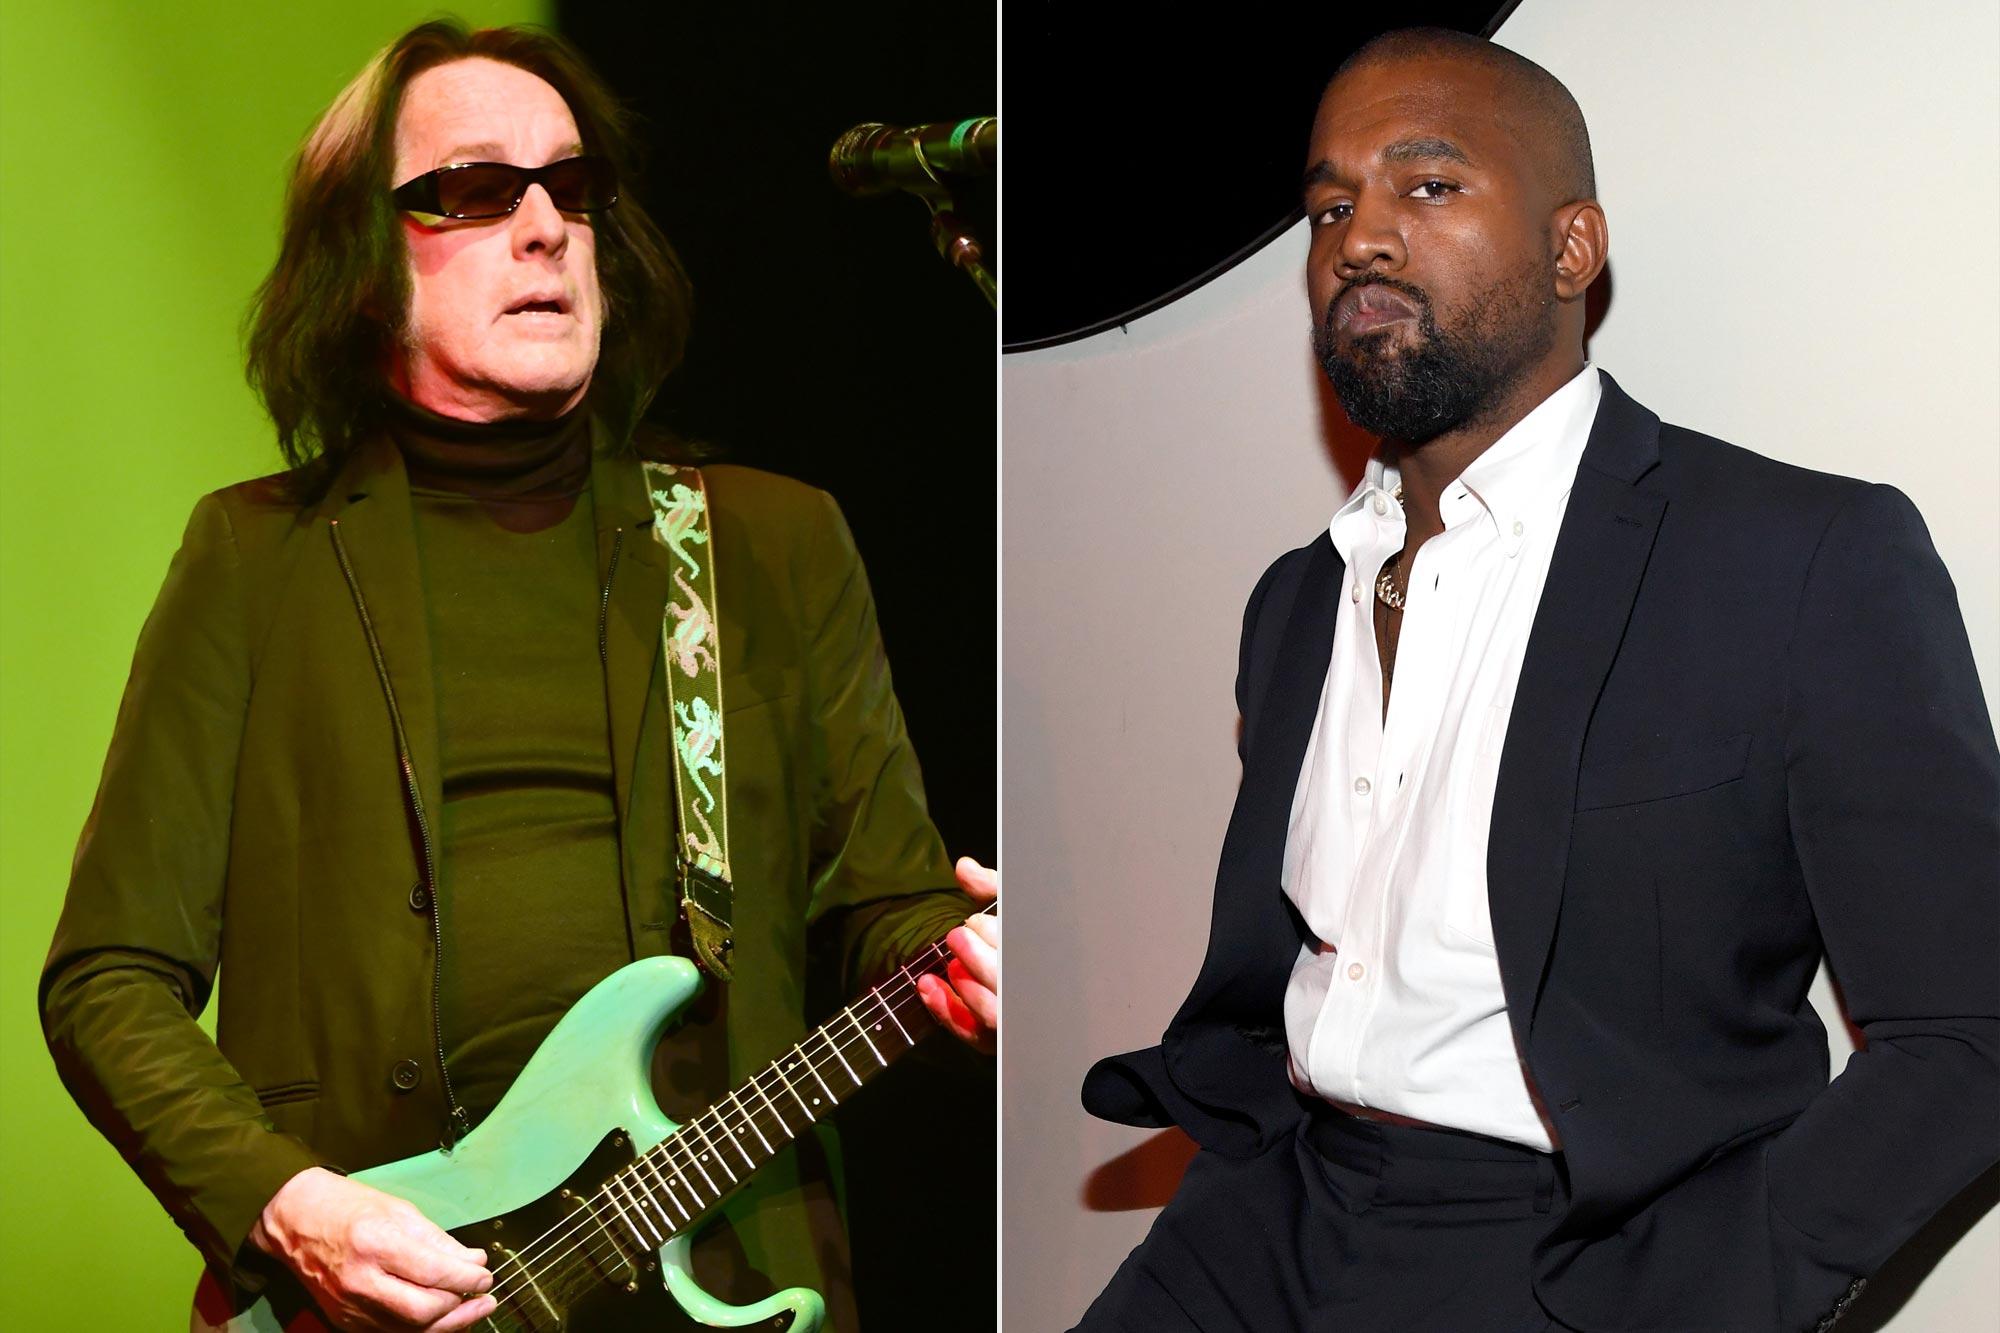 Todd Rundgren and Kanye West